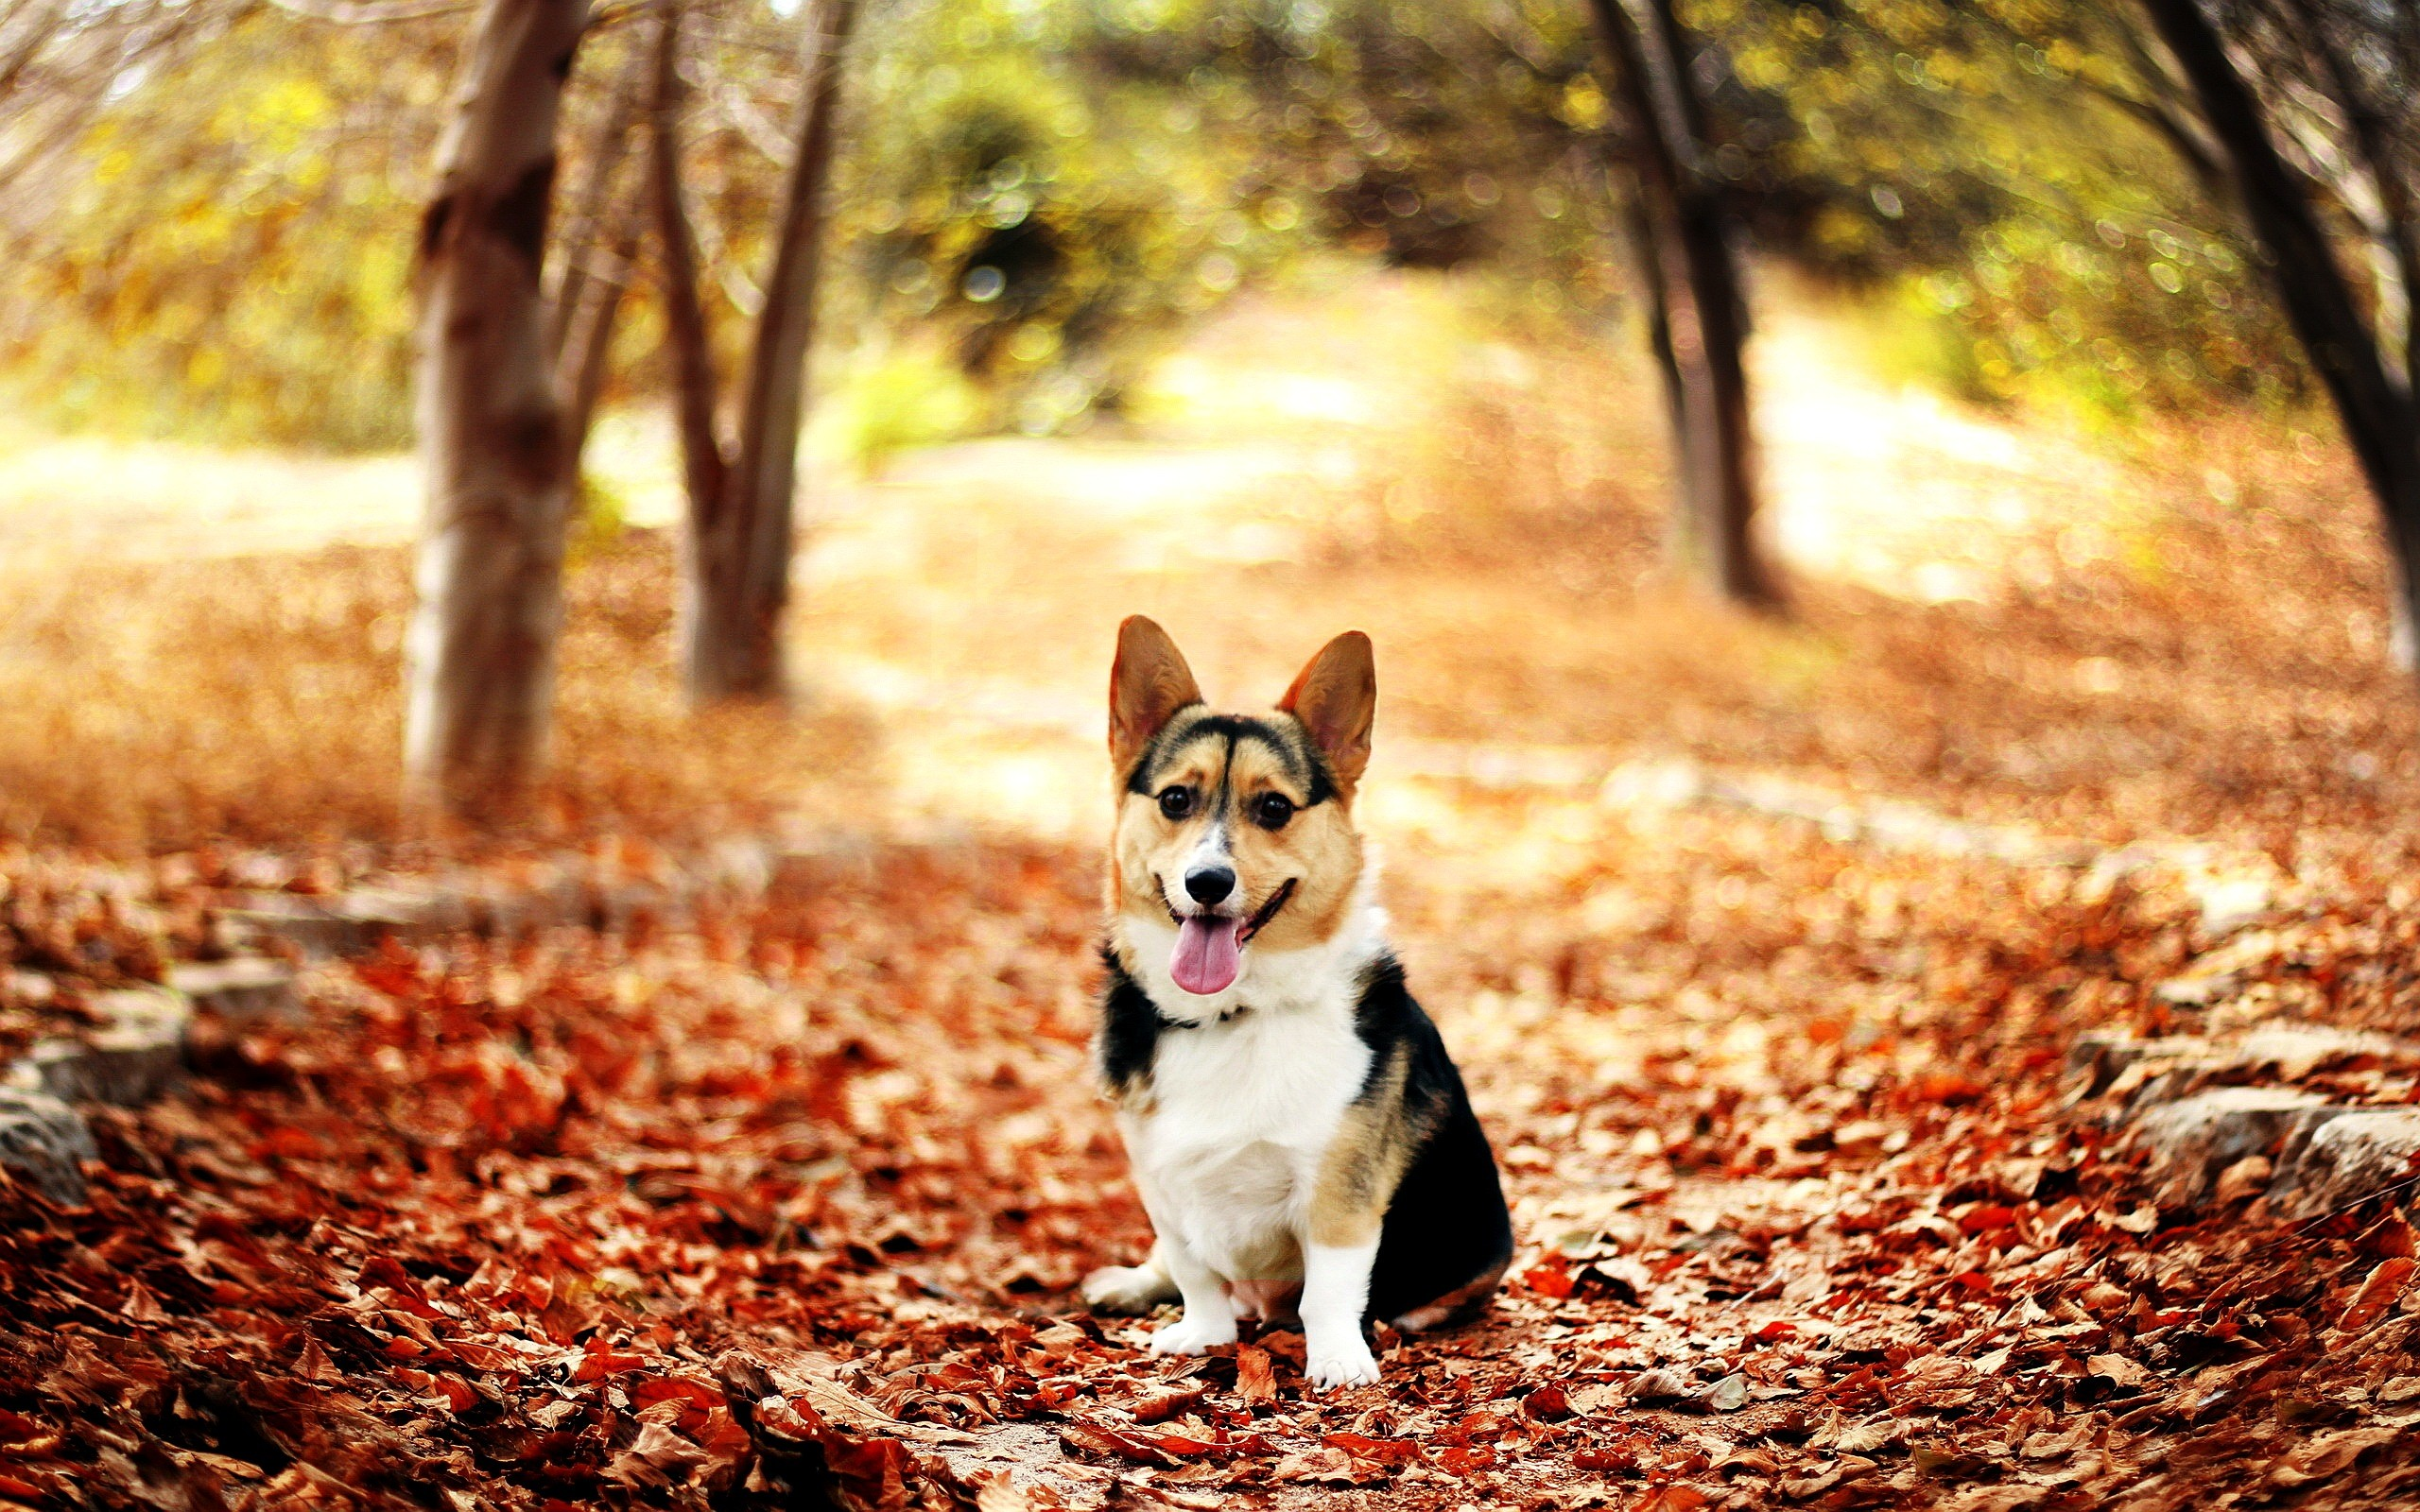 Free Dog Screensaver And Wallpaper : Free Dog Screensaver and Wallpaper  autumn